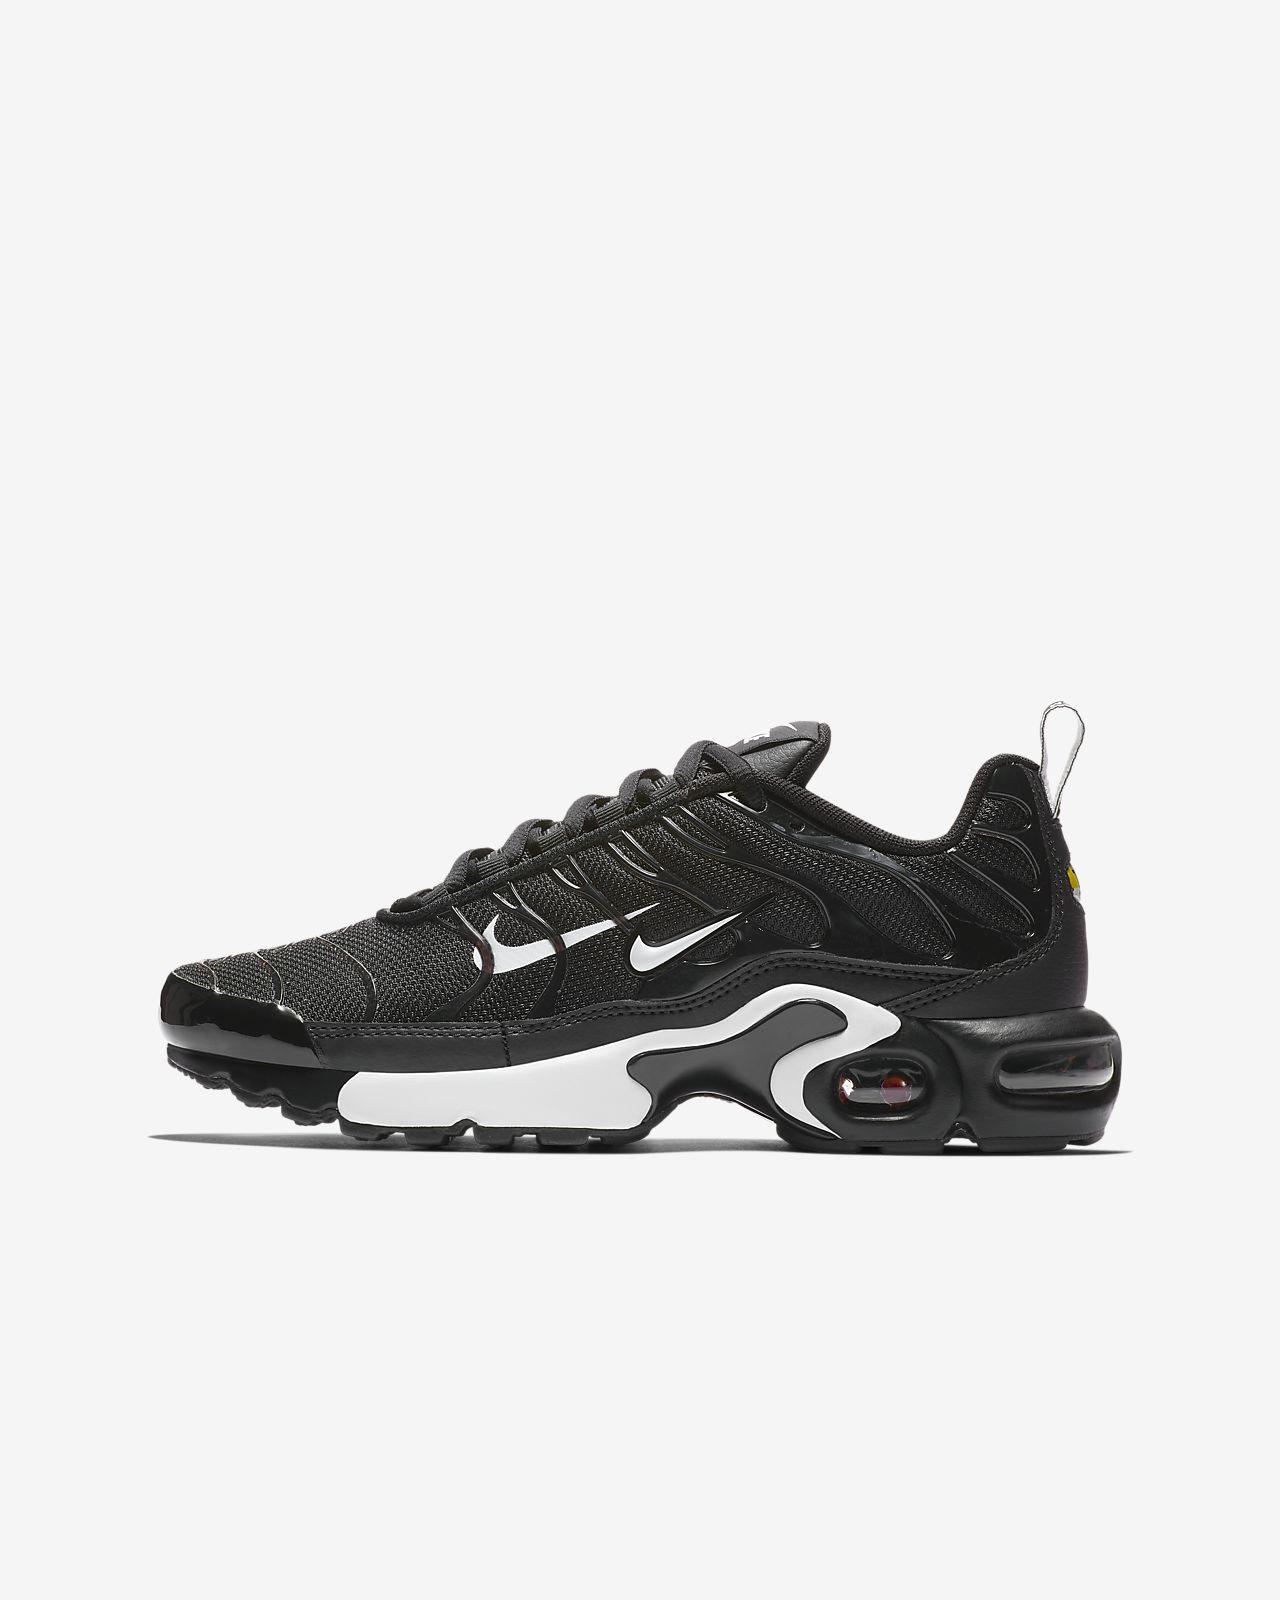 timeless design 665c1 3cf87 Nike Air Max Plus SE-sko til store børn